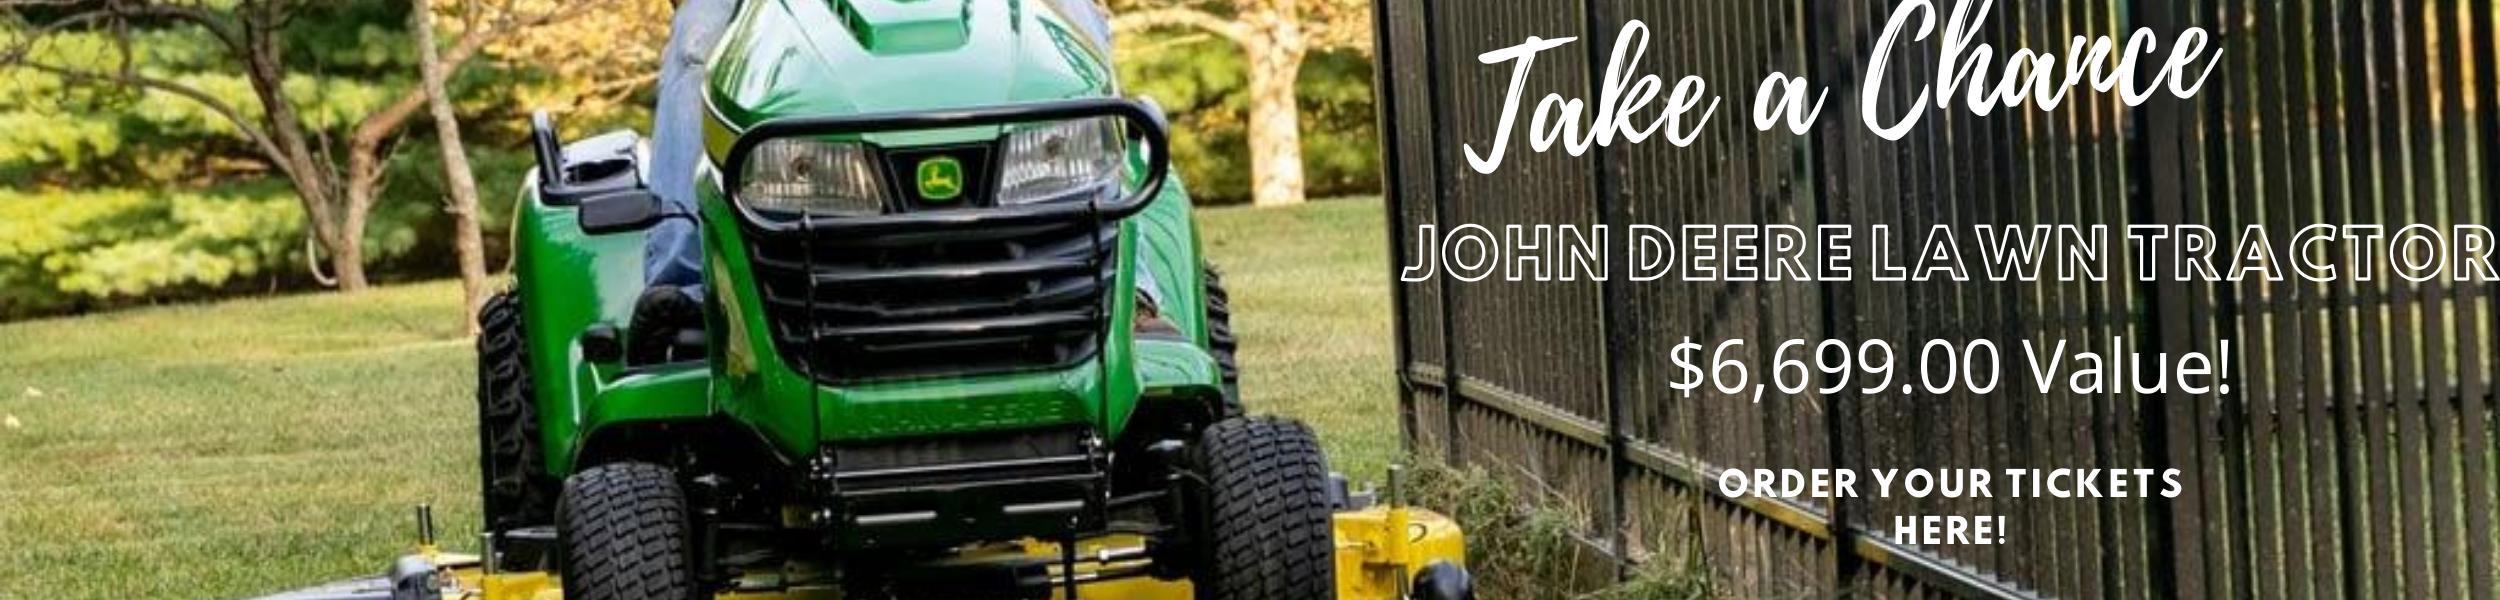 Lawn Mower Header for Website